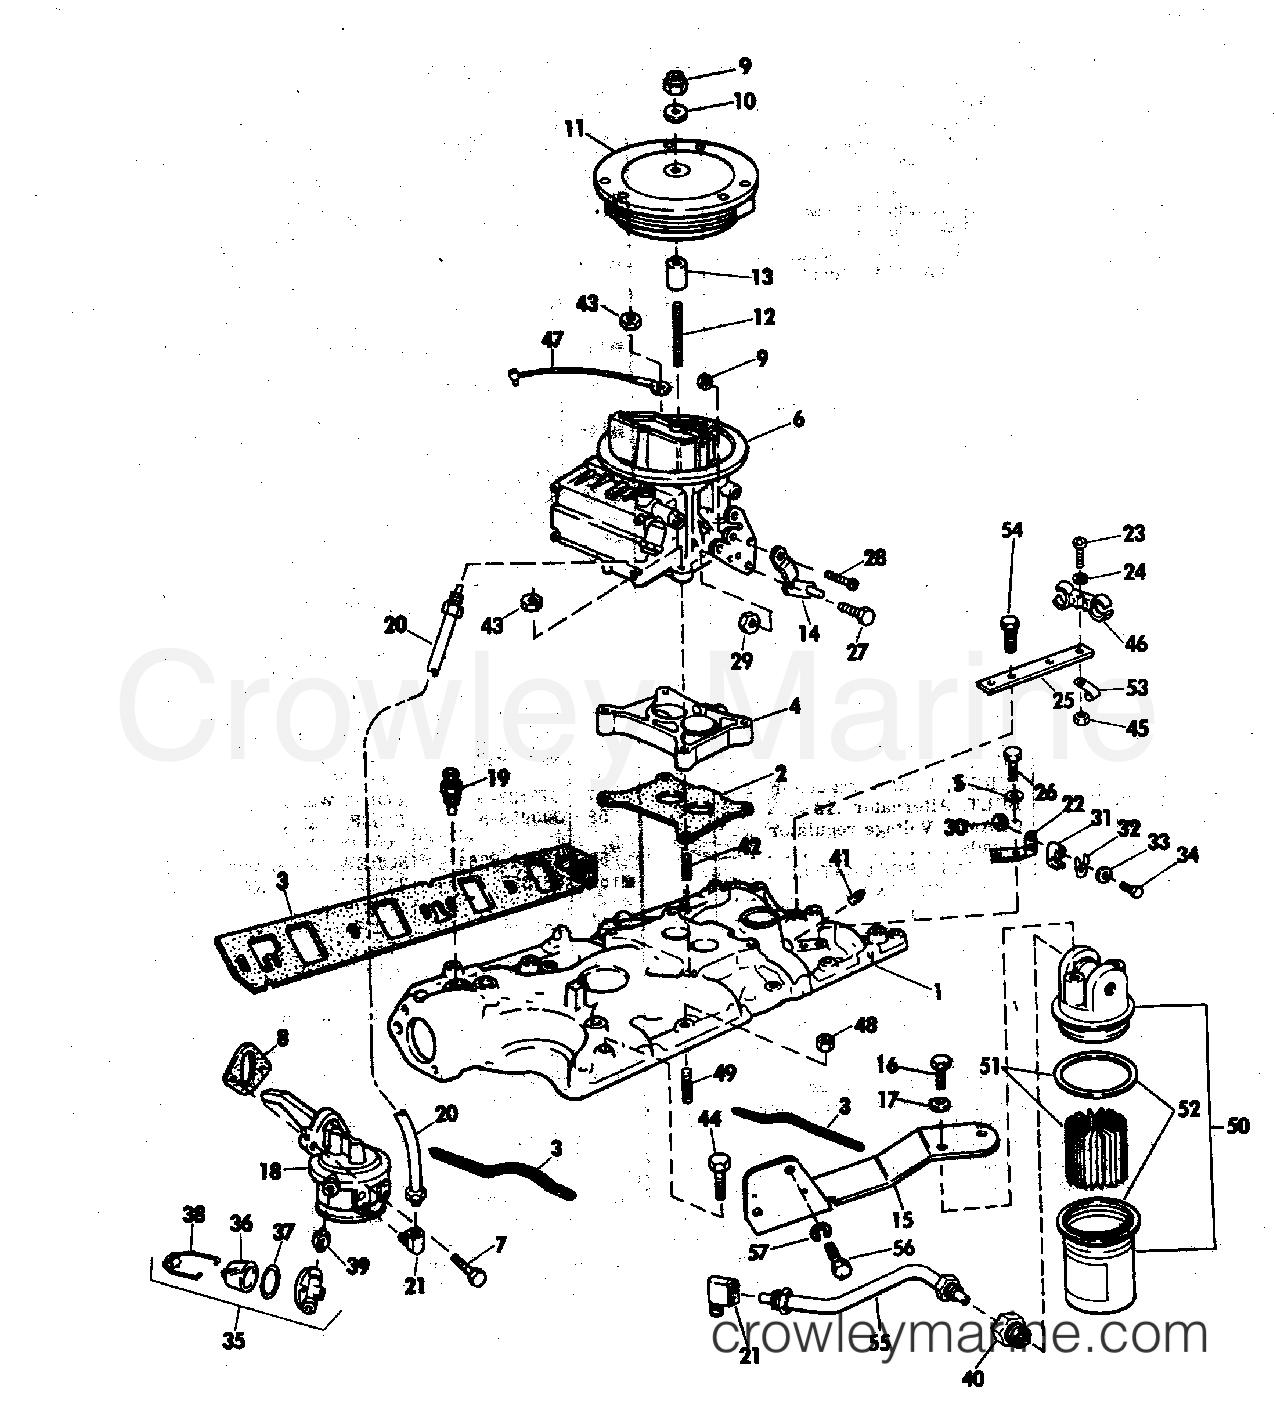 Intake Manifold Fuel Pump And Caruburtor Lines 175 190